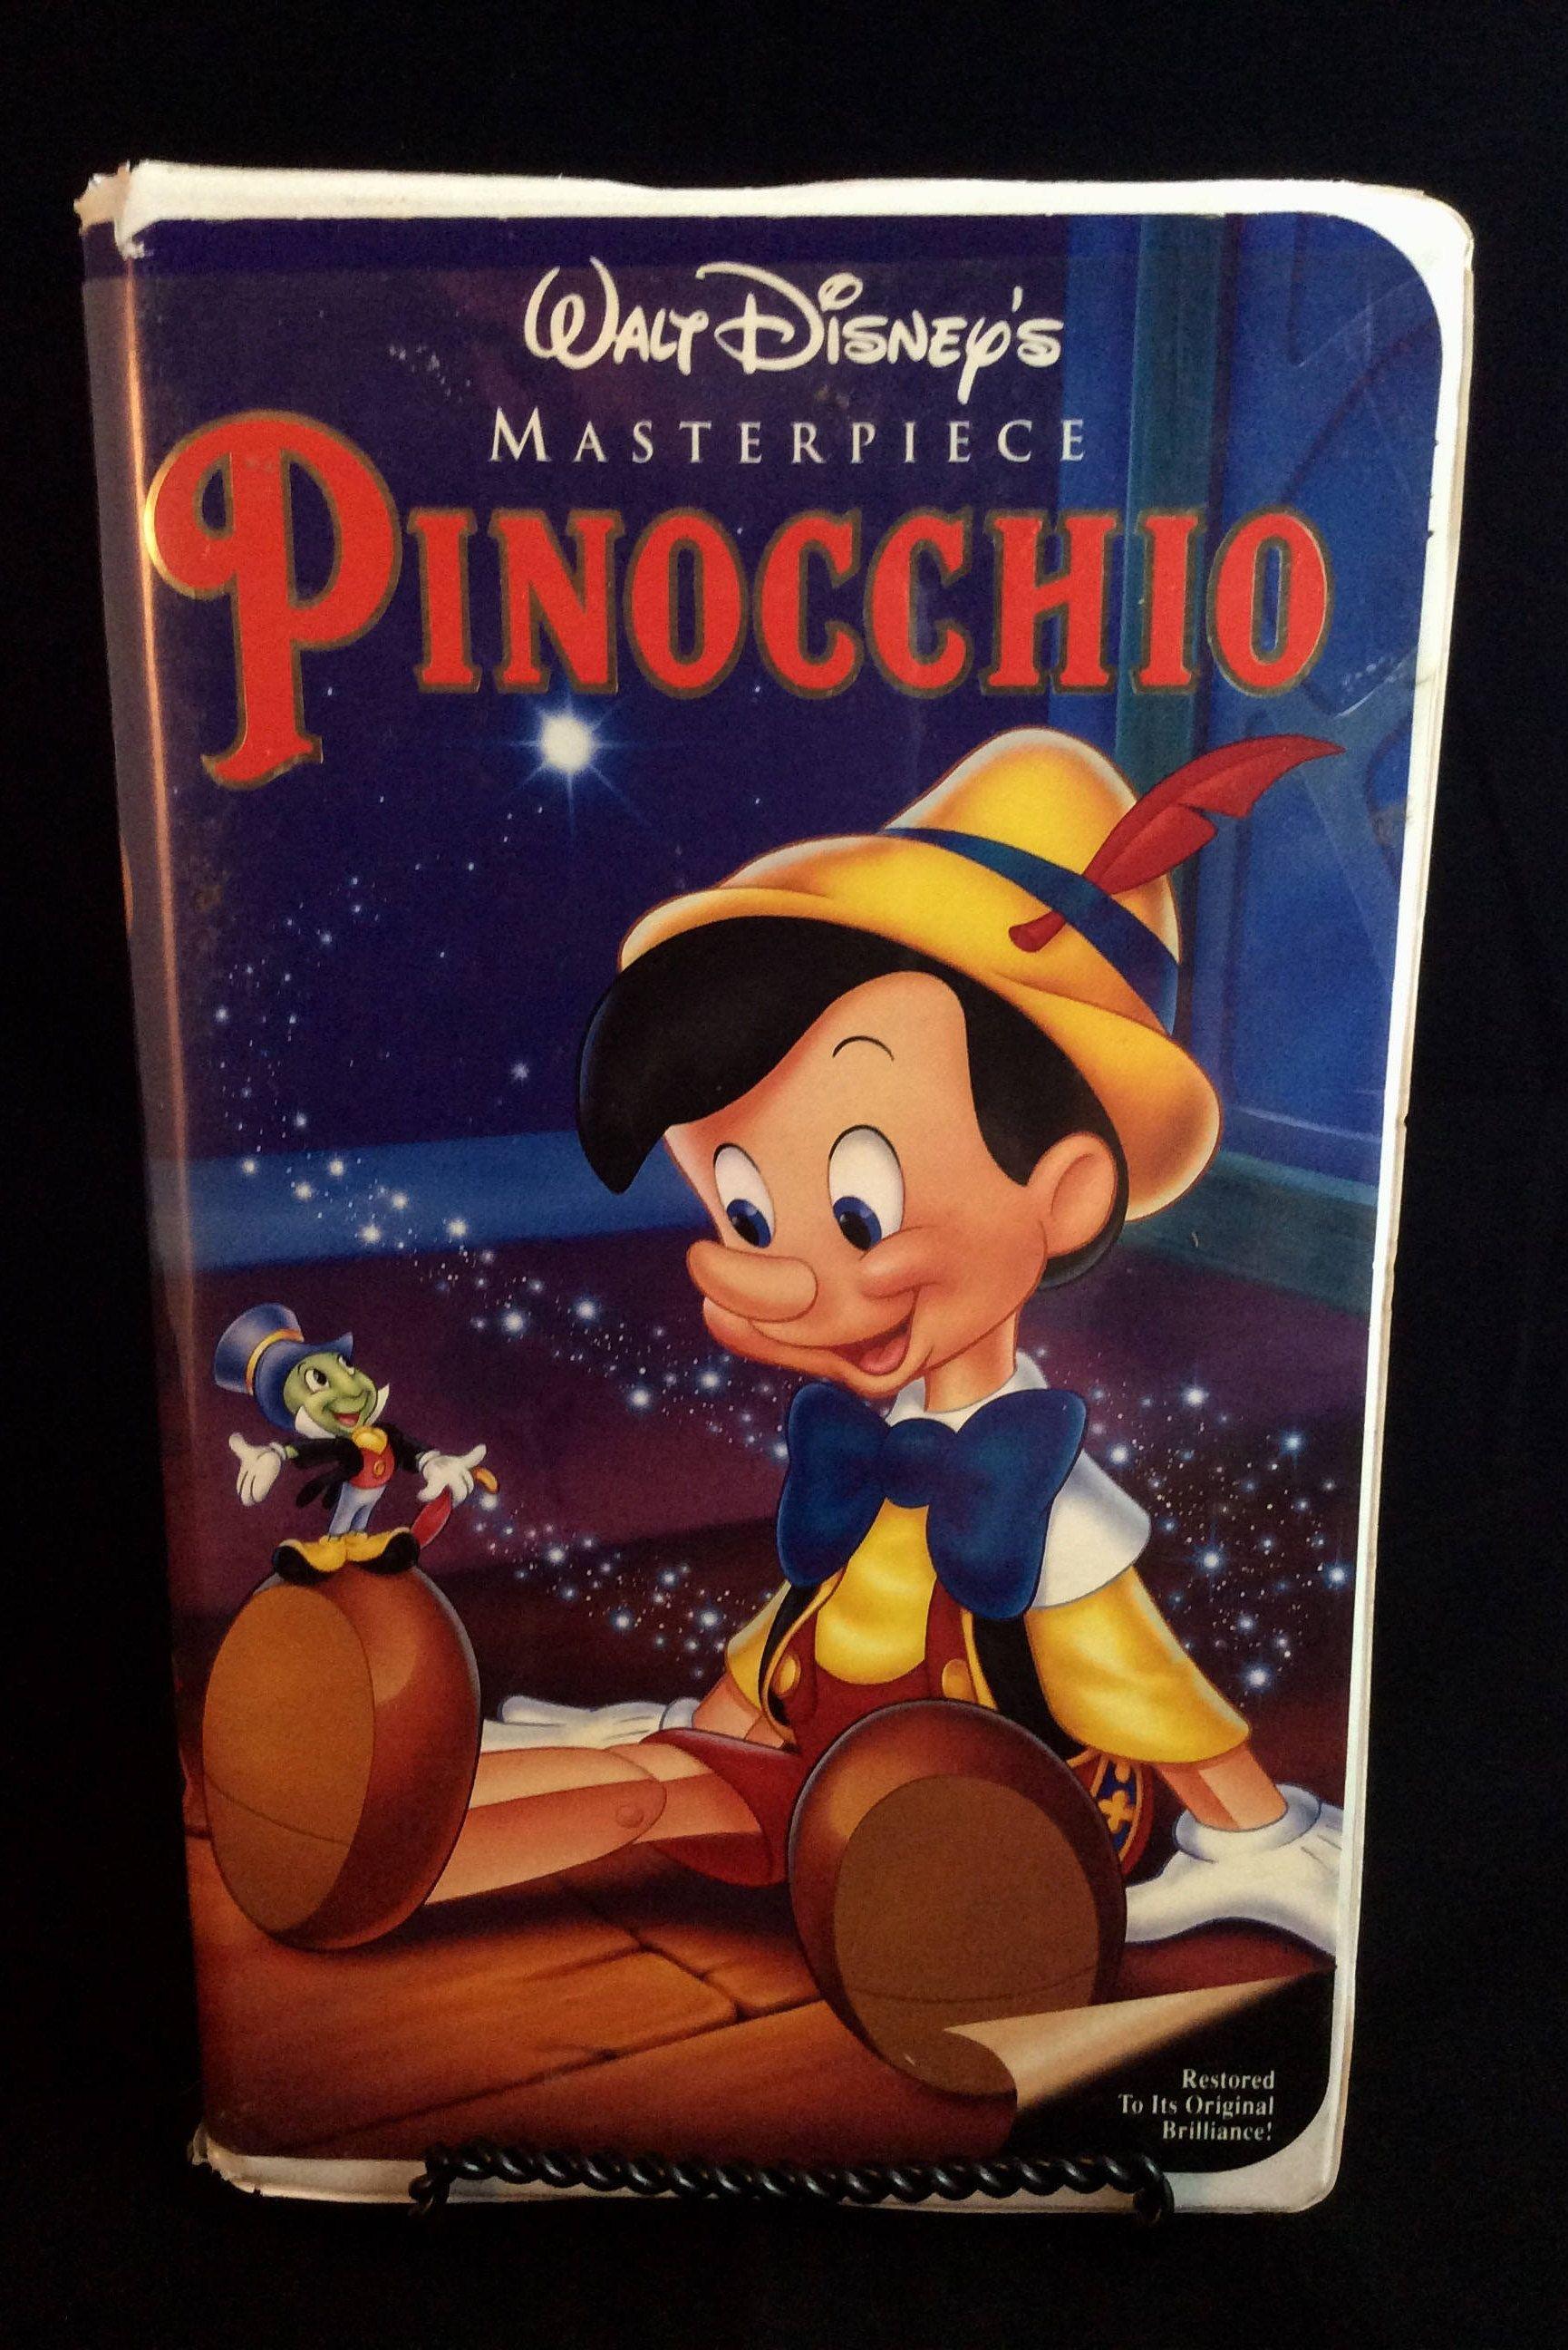 Pinocchio walt disneys masterpiece collection vintage